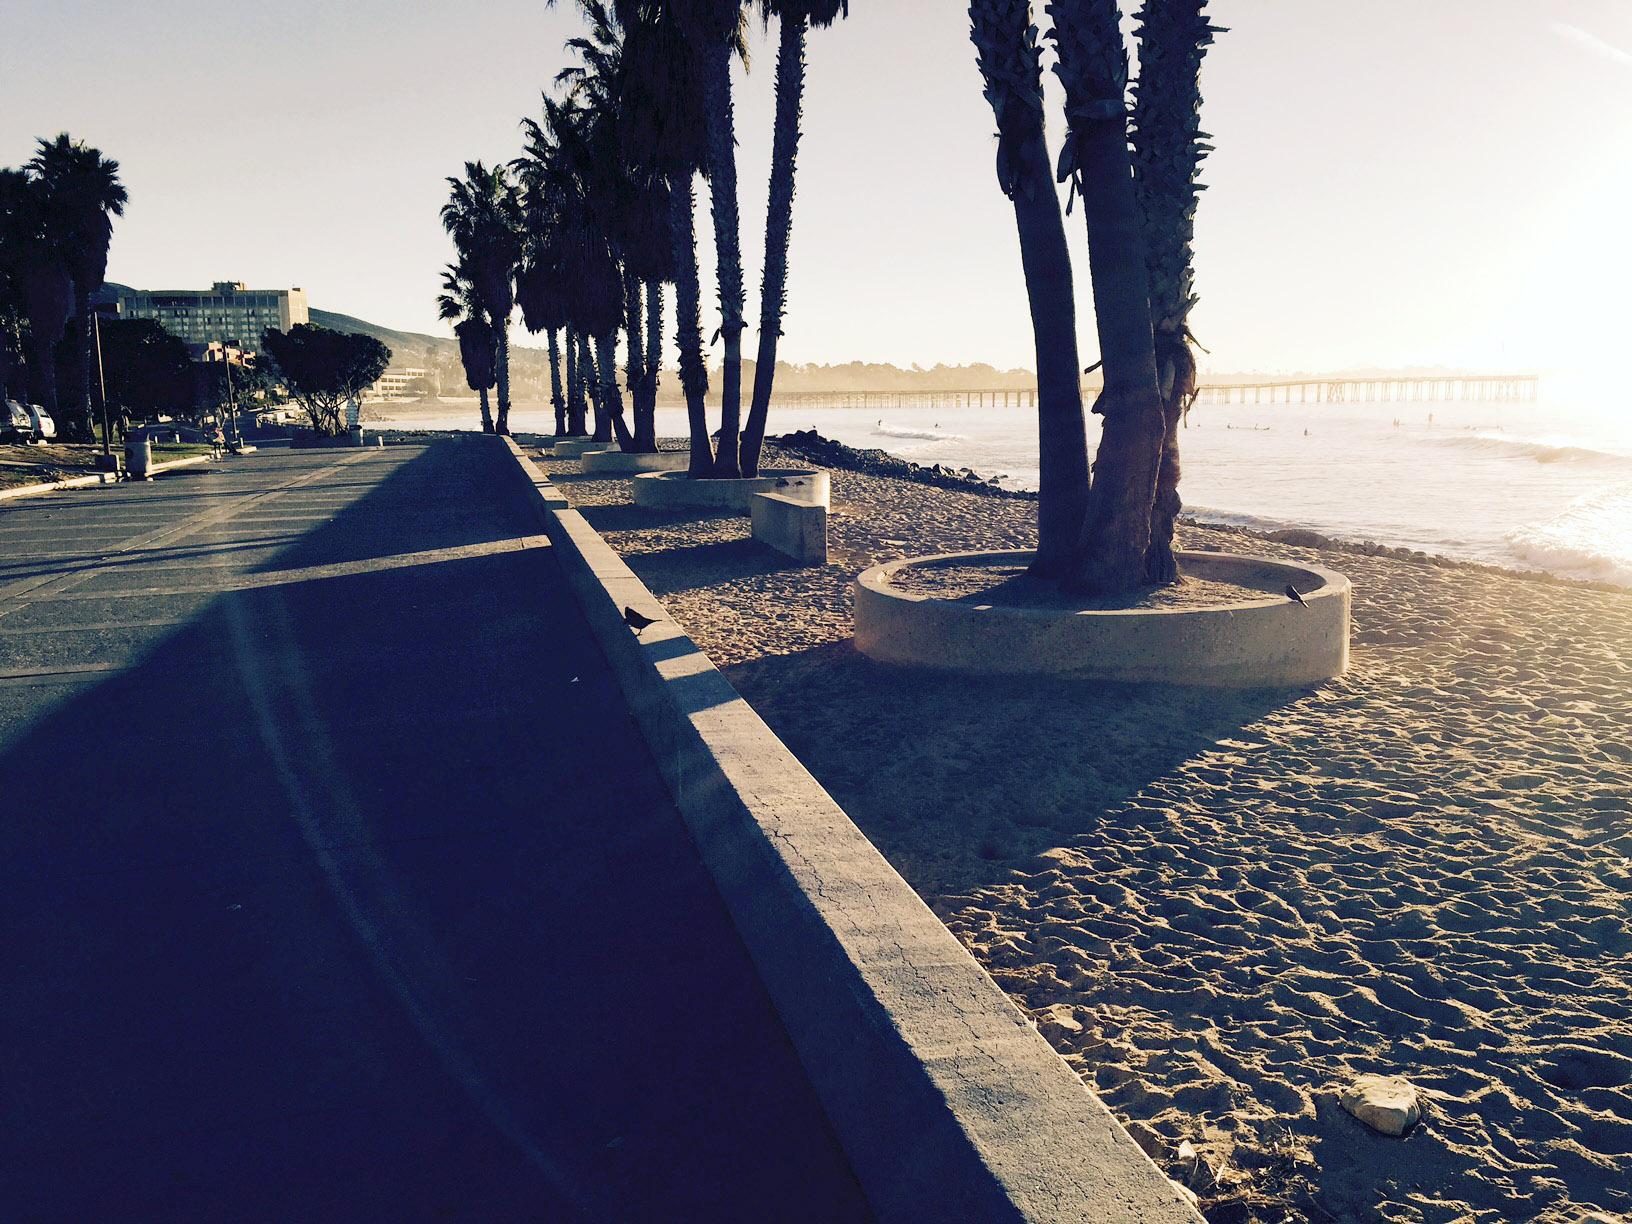 Waves, sand, palm trees, path.